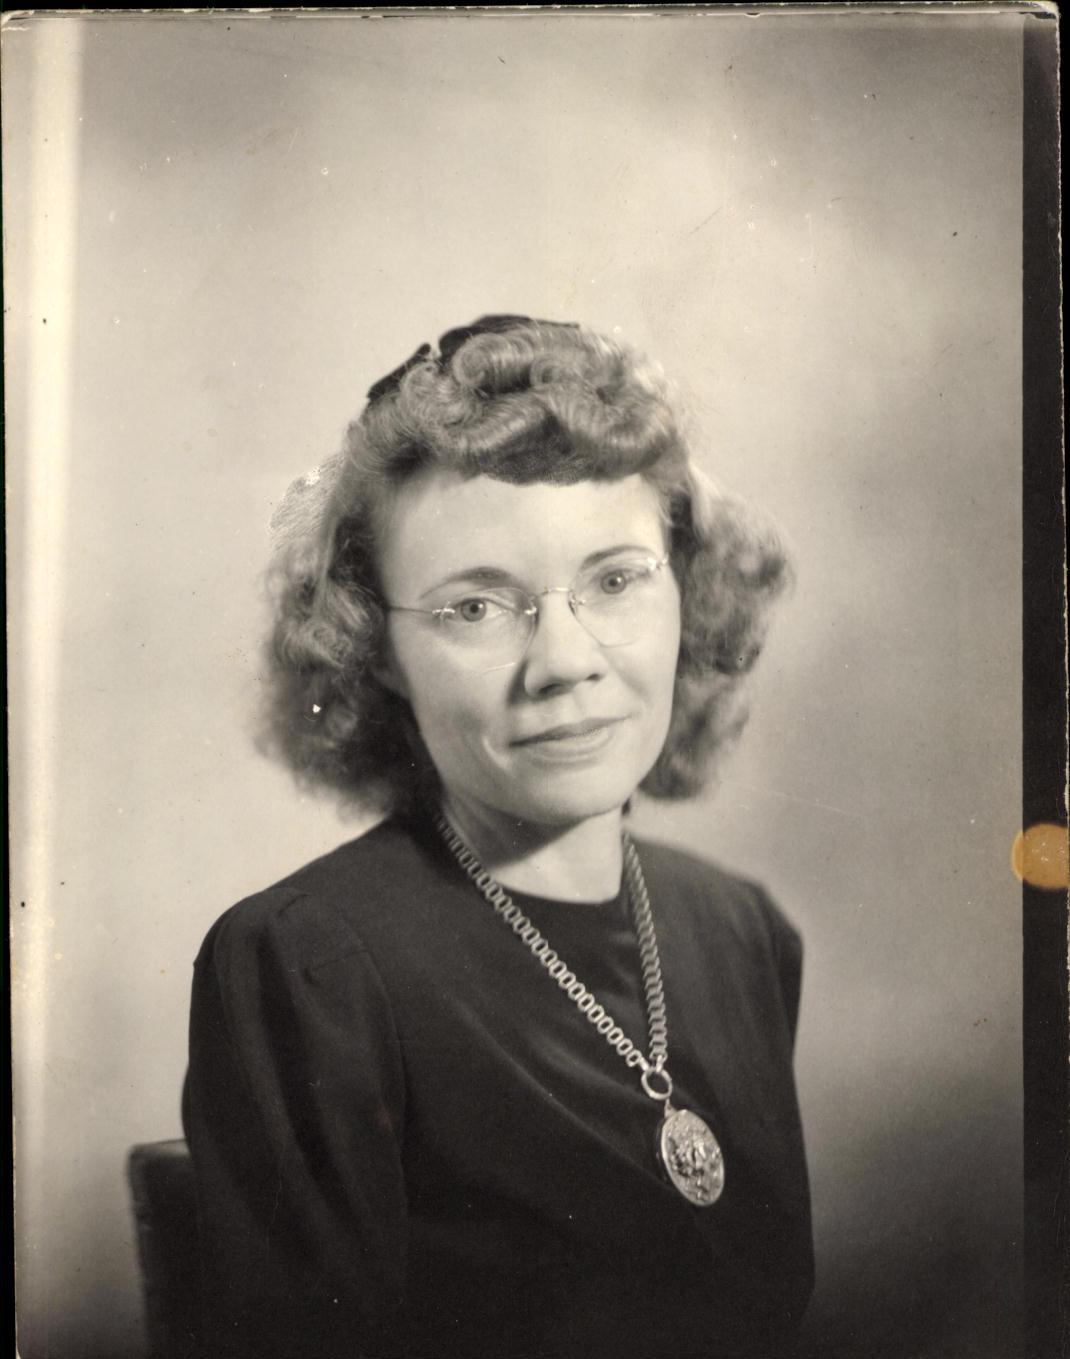 Martha Anne Rothrock Frierson: Sep 18, 1911 - Dec 1, 2007